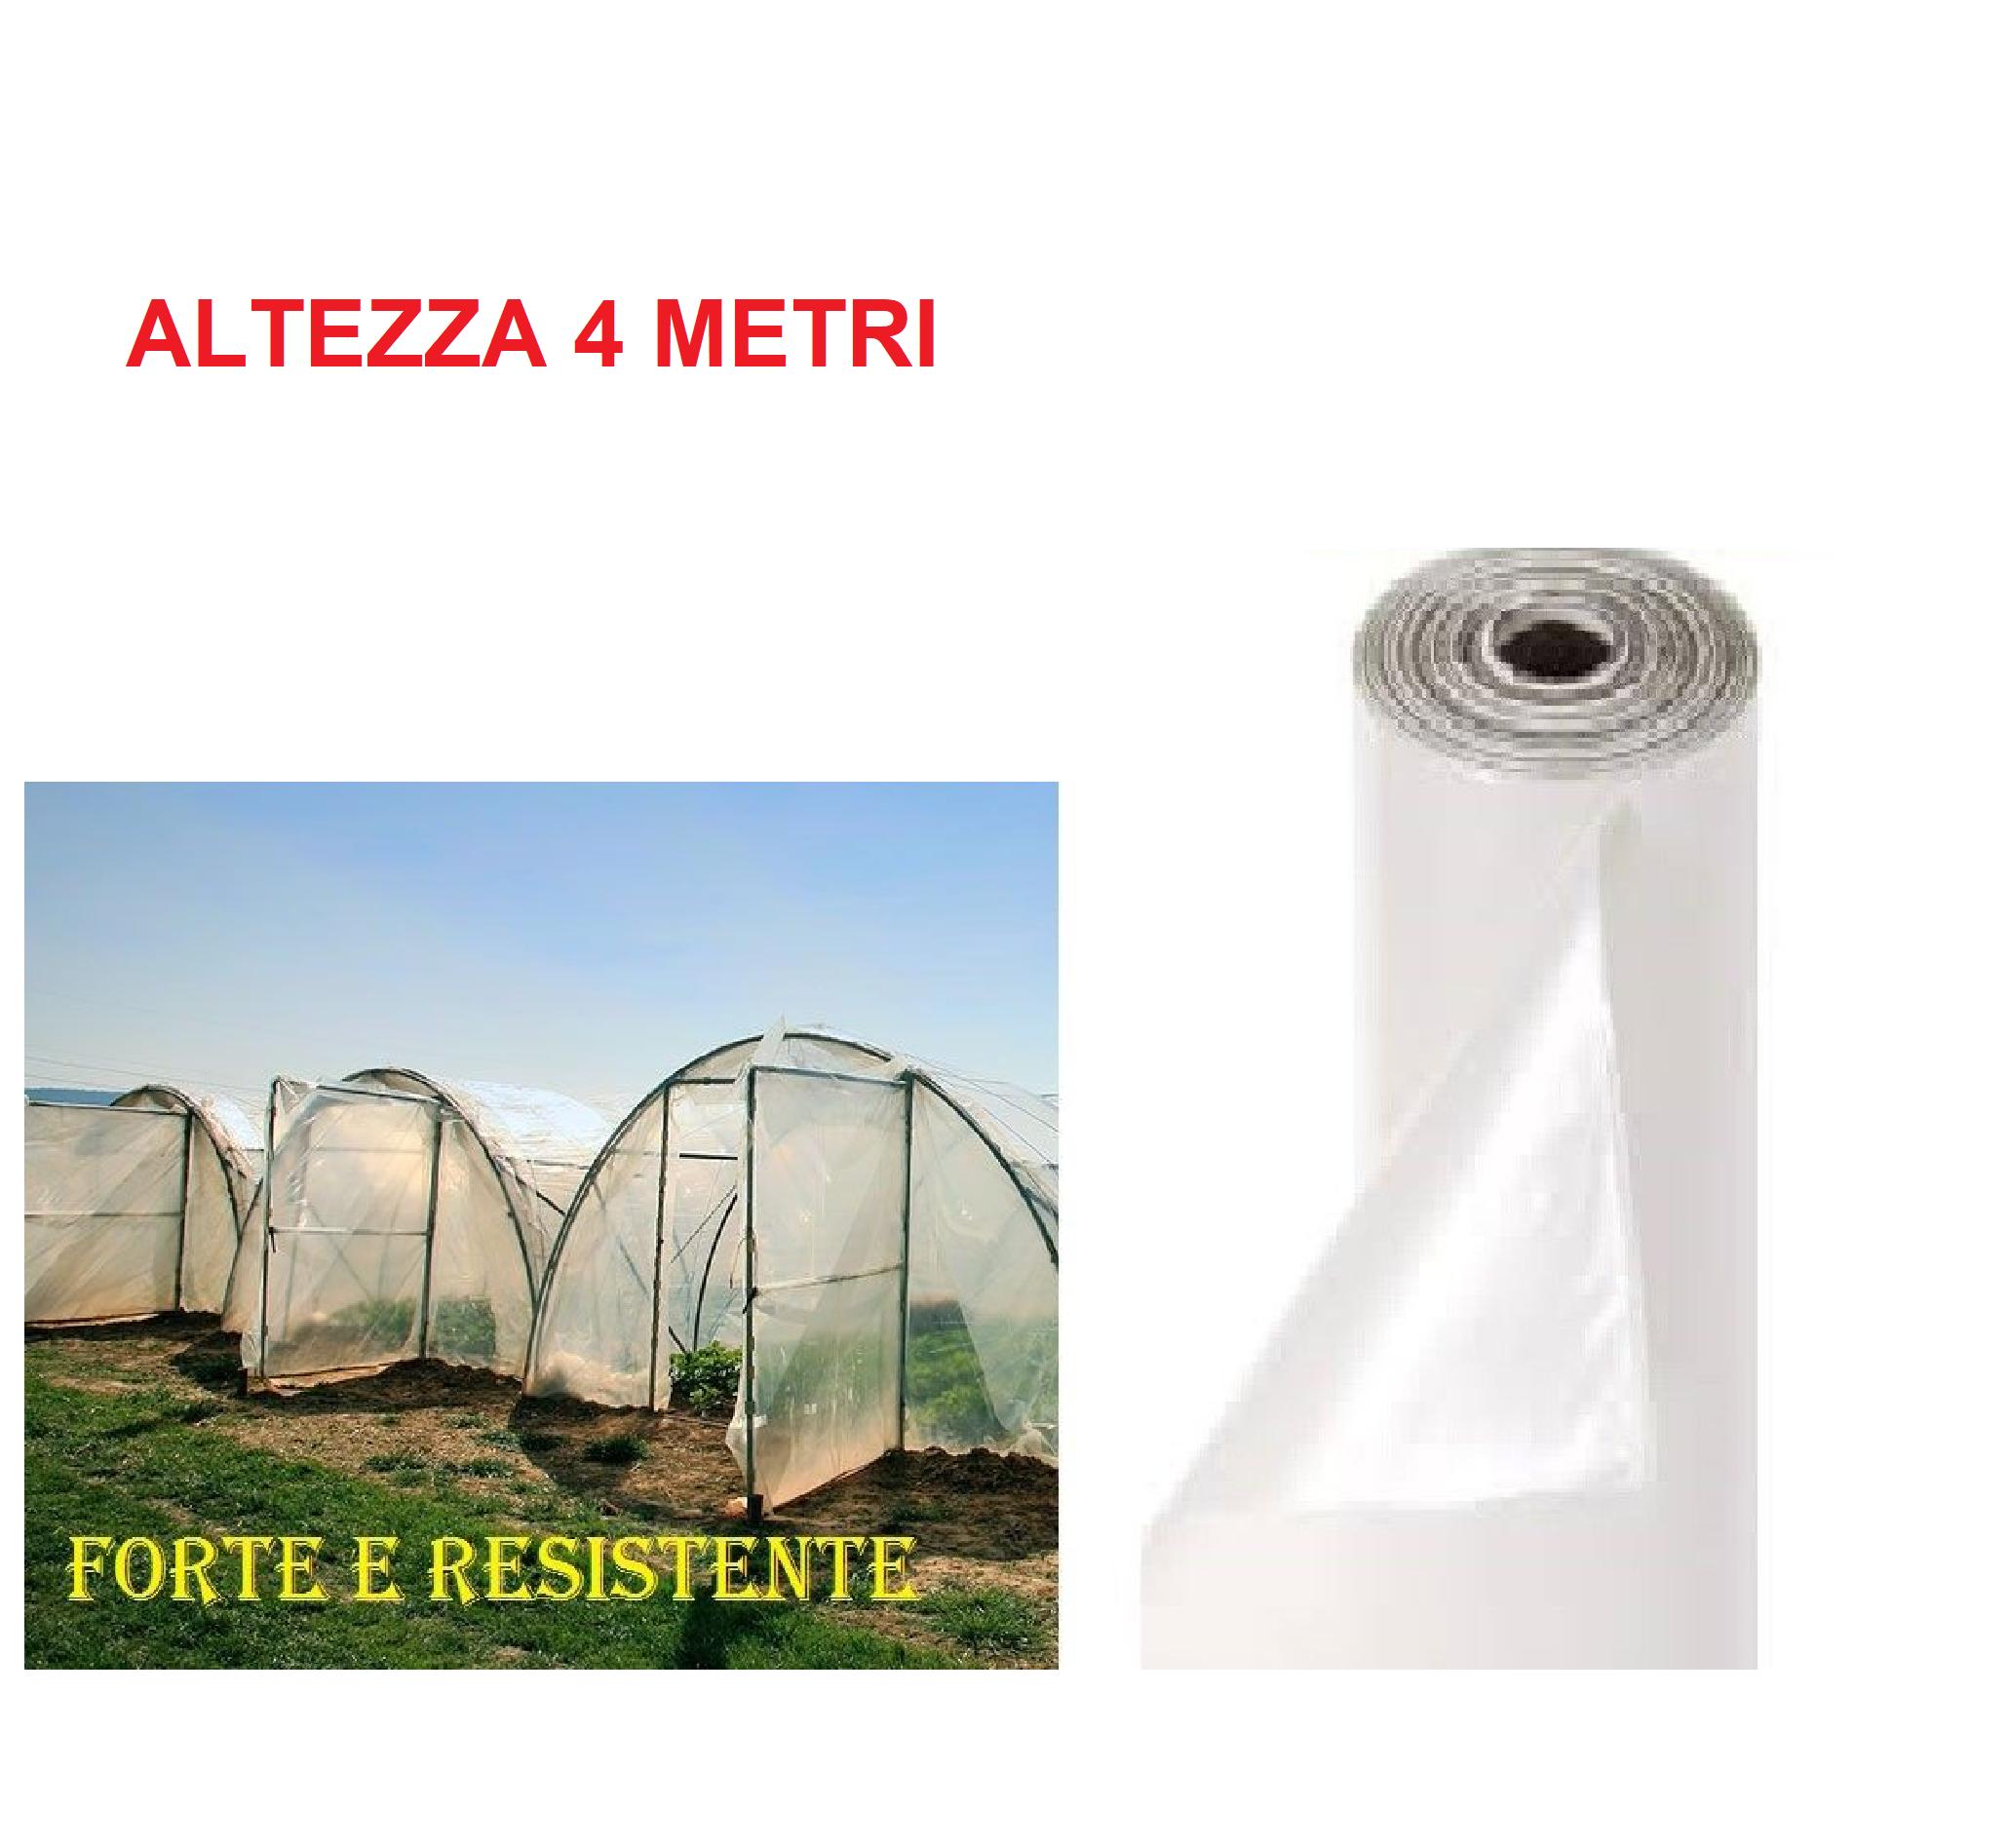 Copertura Giardino Fai Da Te telo polietilene foglia nylon copertura serra gazebo giardino trasparente h  4mt